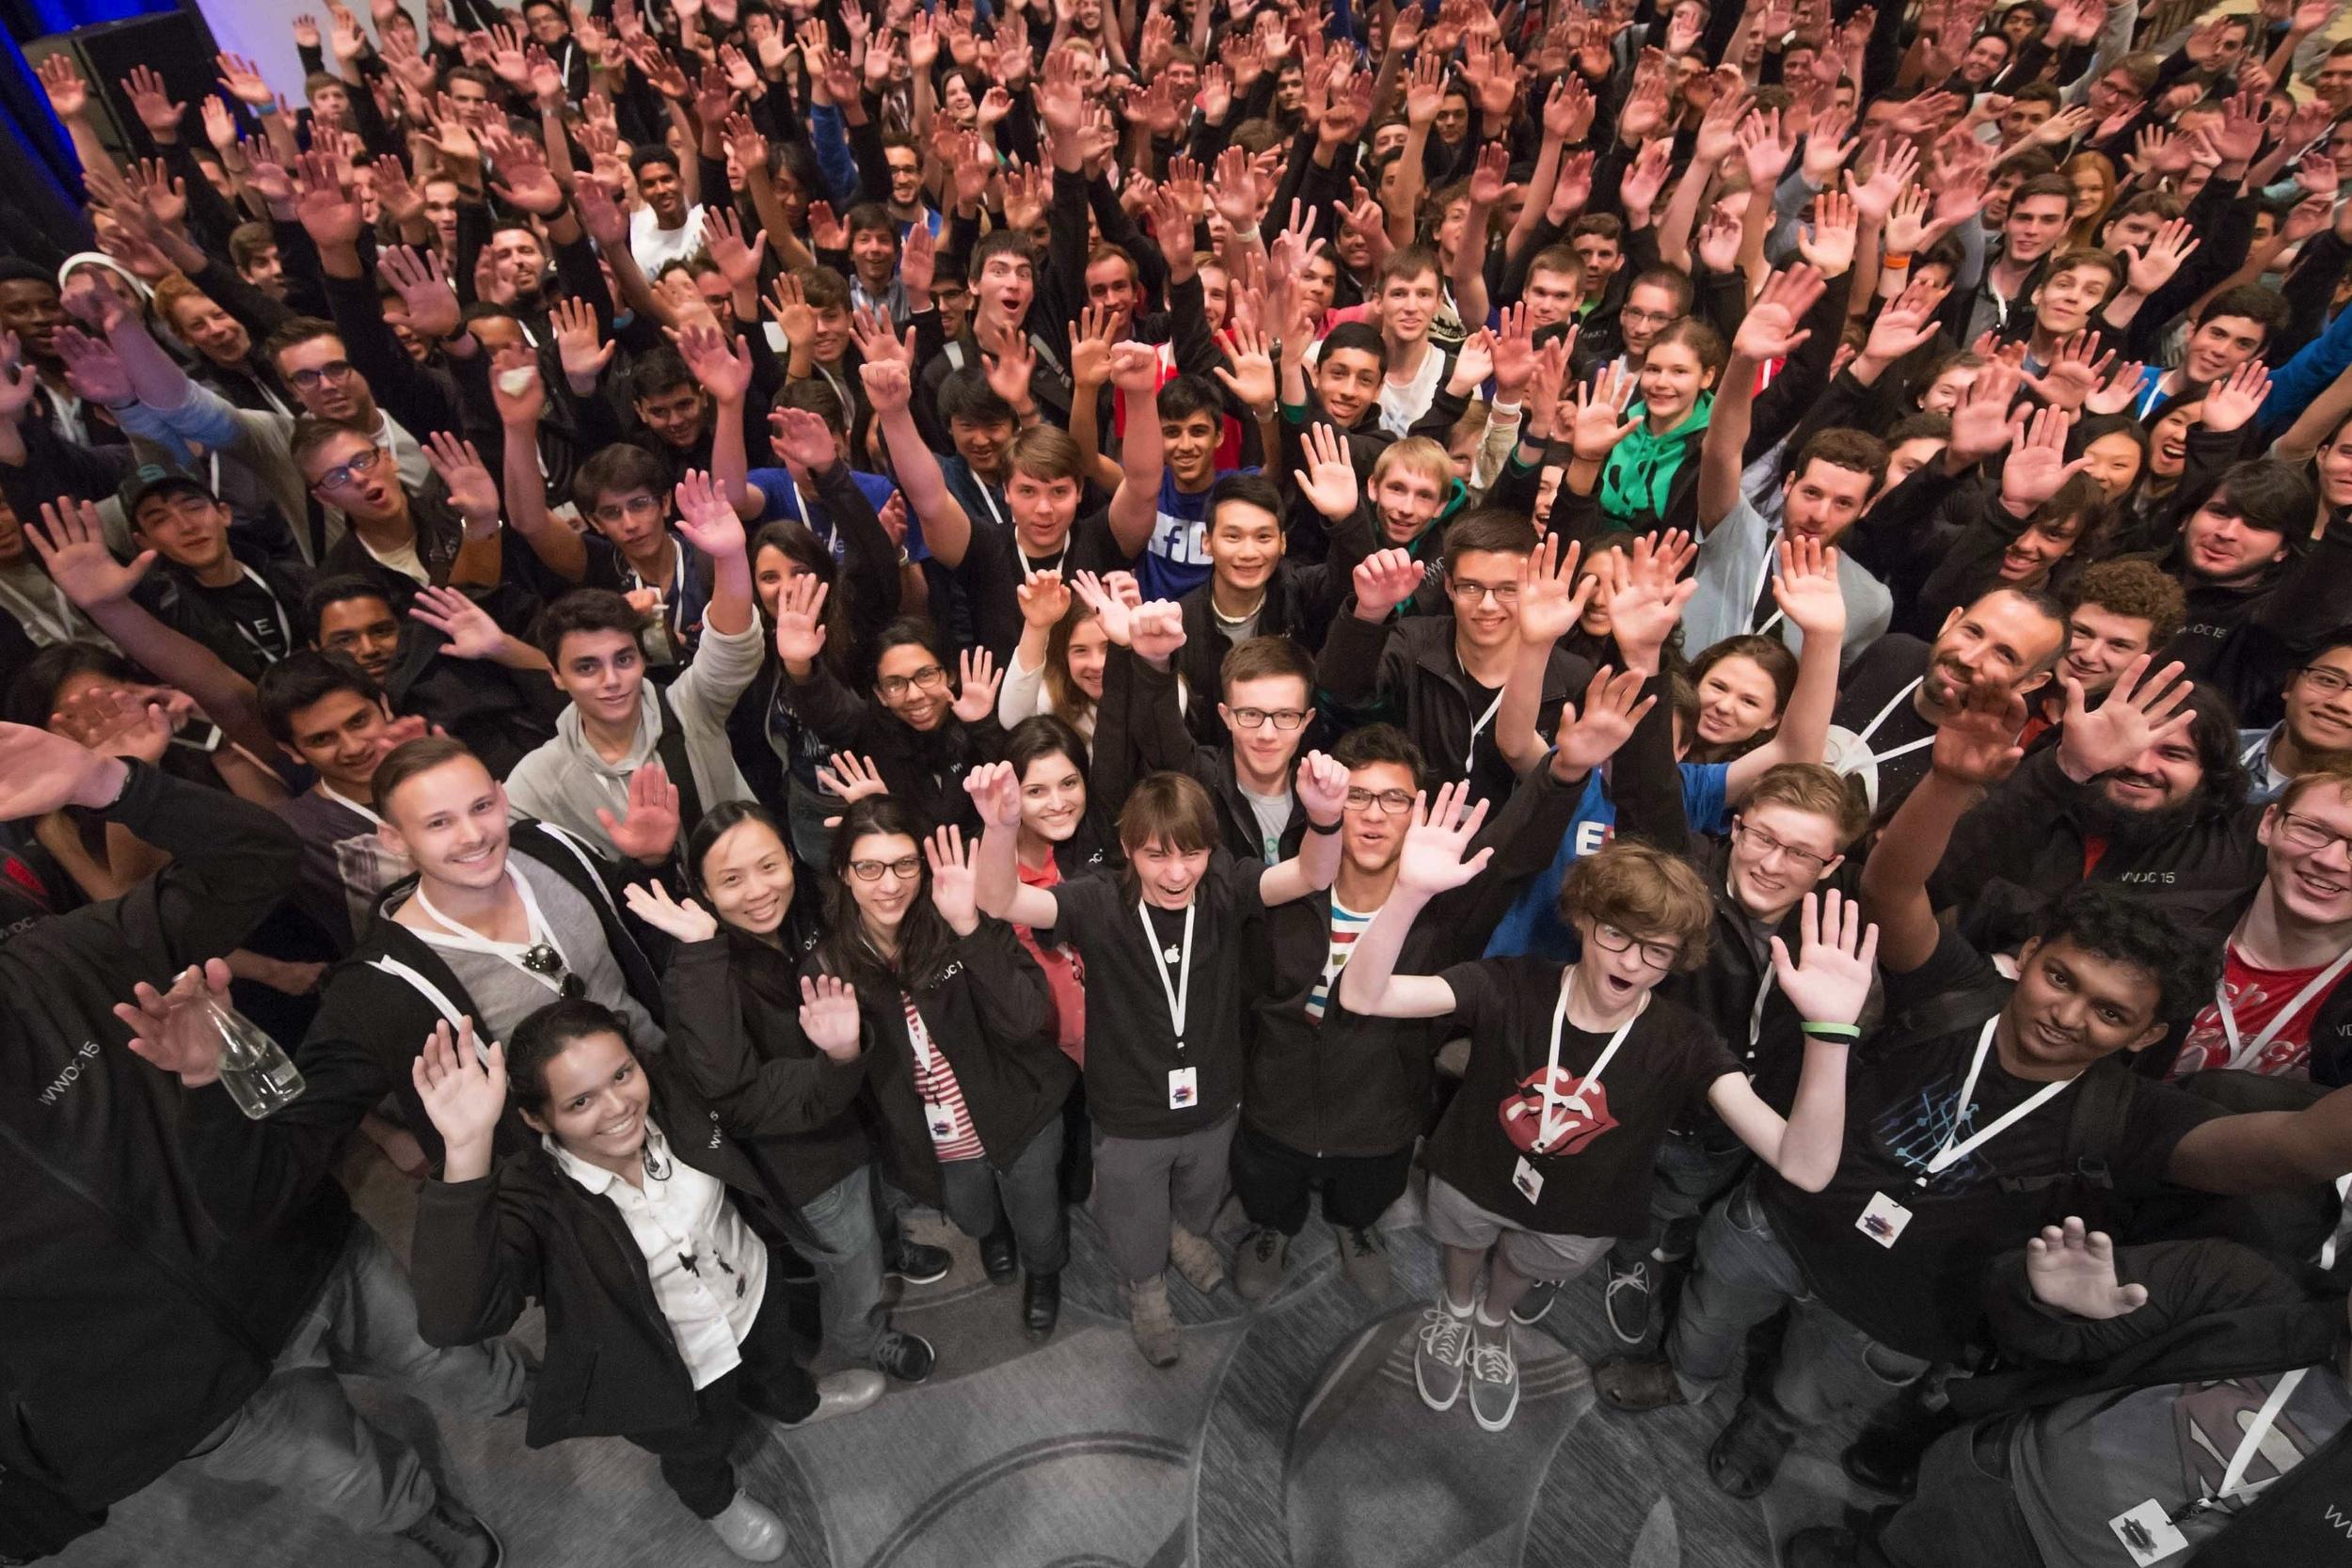 WWDC 2015 Scholarship Winners ( http://developer.apple.com )